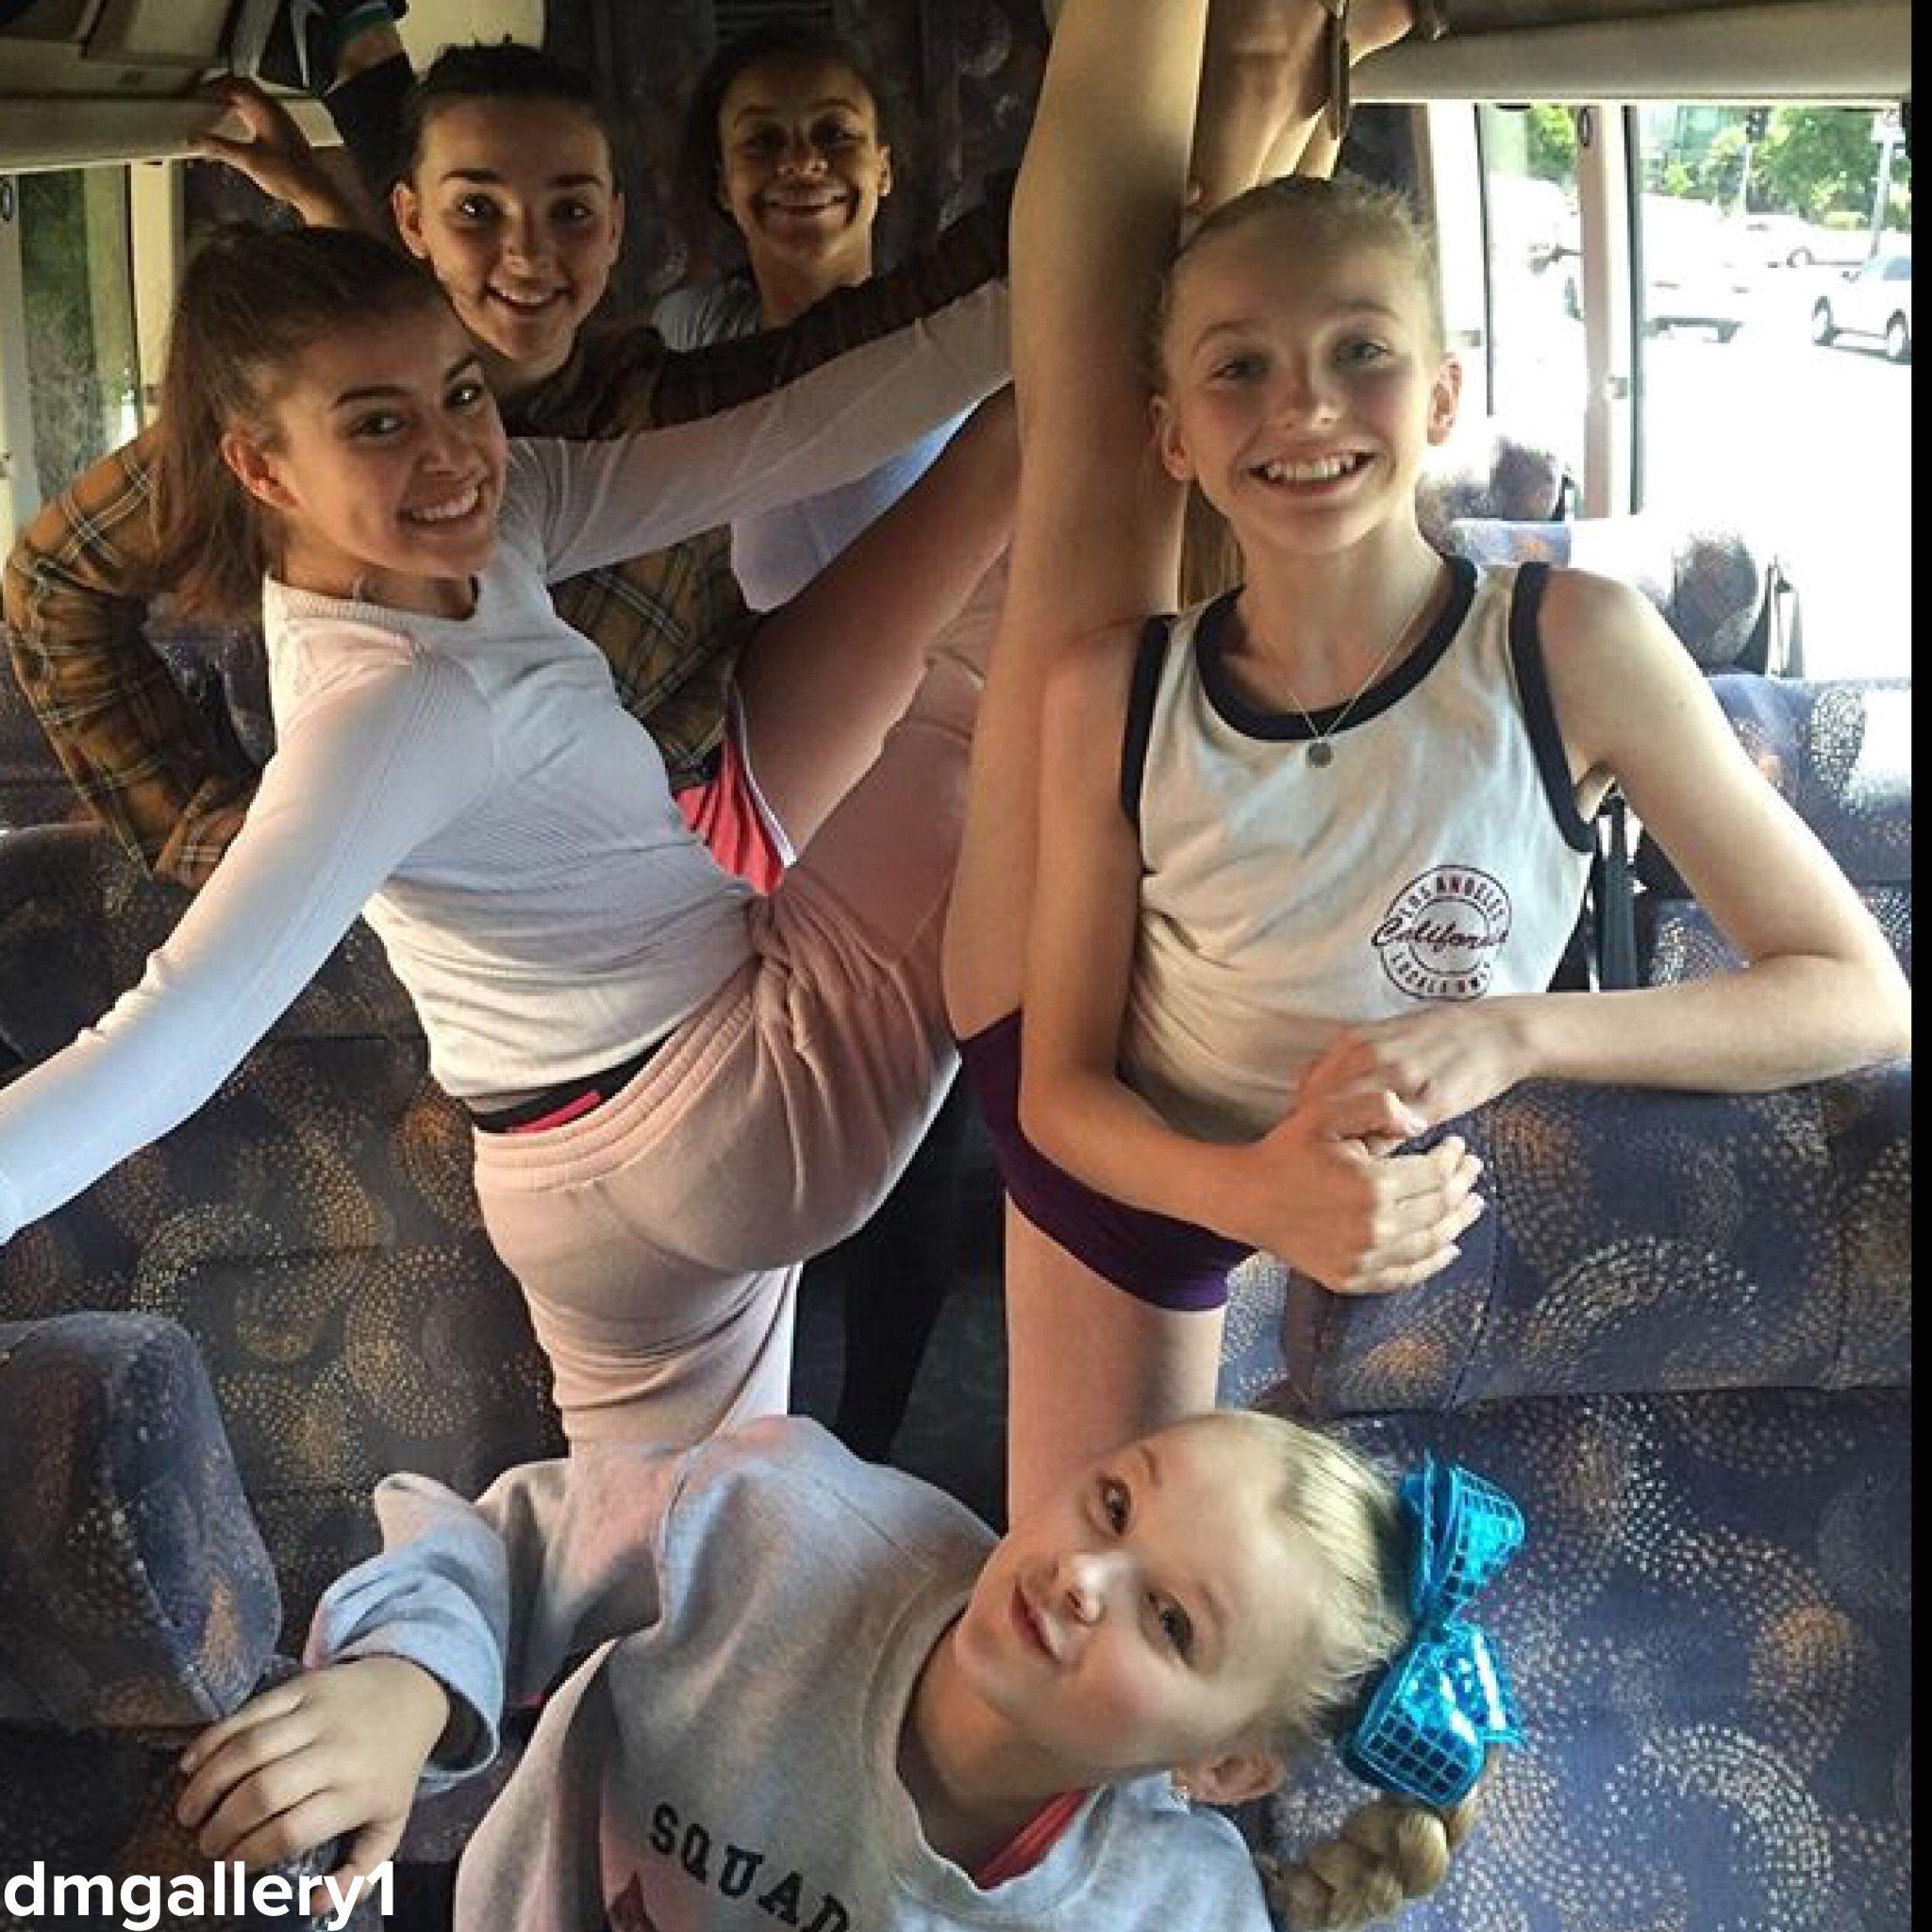 Brynn rumfallo stretching on the bus follow dmgallery1 dance jojo siwa kalani hiliker brynn rumfallo kendall vertes and nia frazier kristyandbryce Choice Image